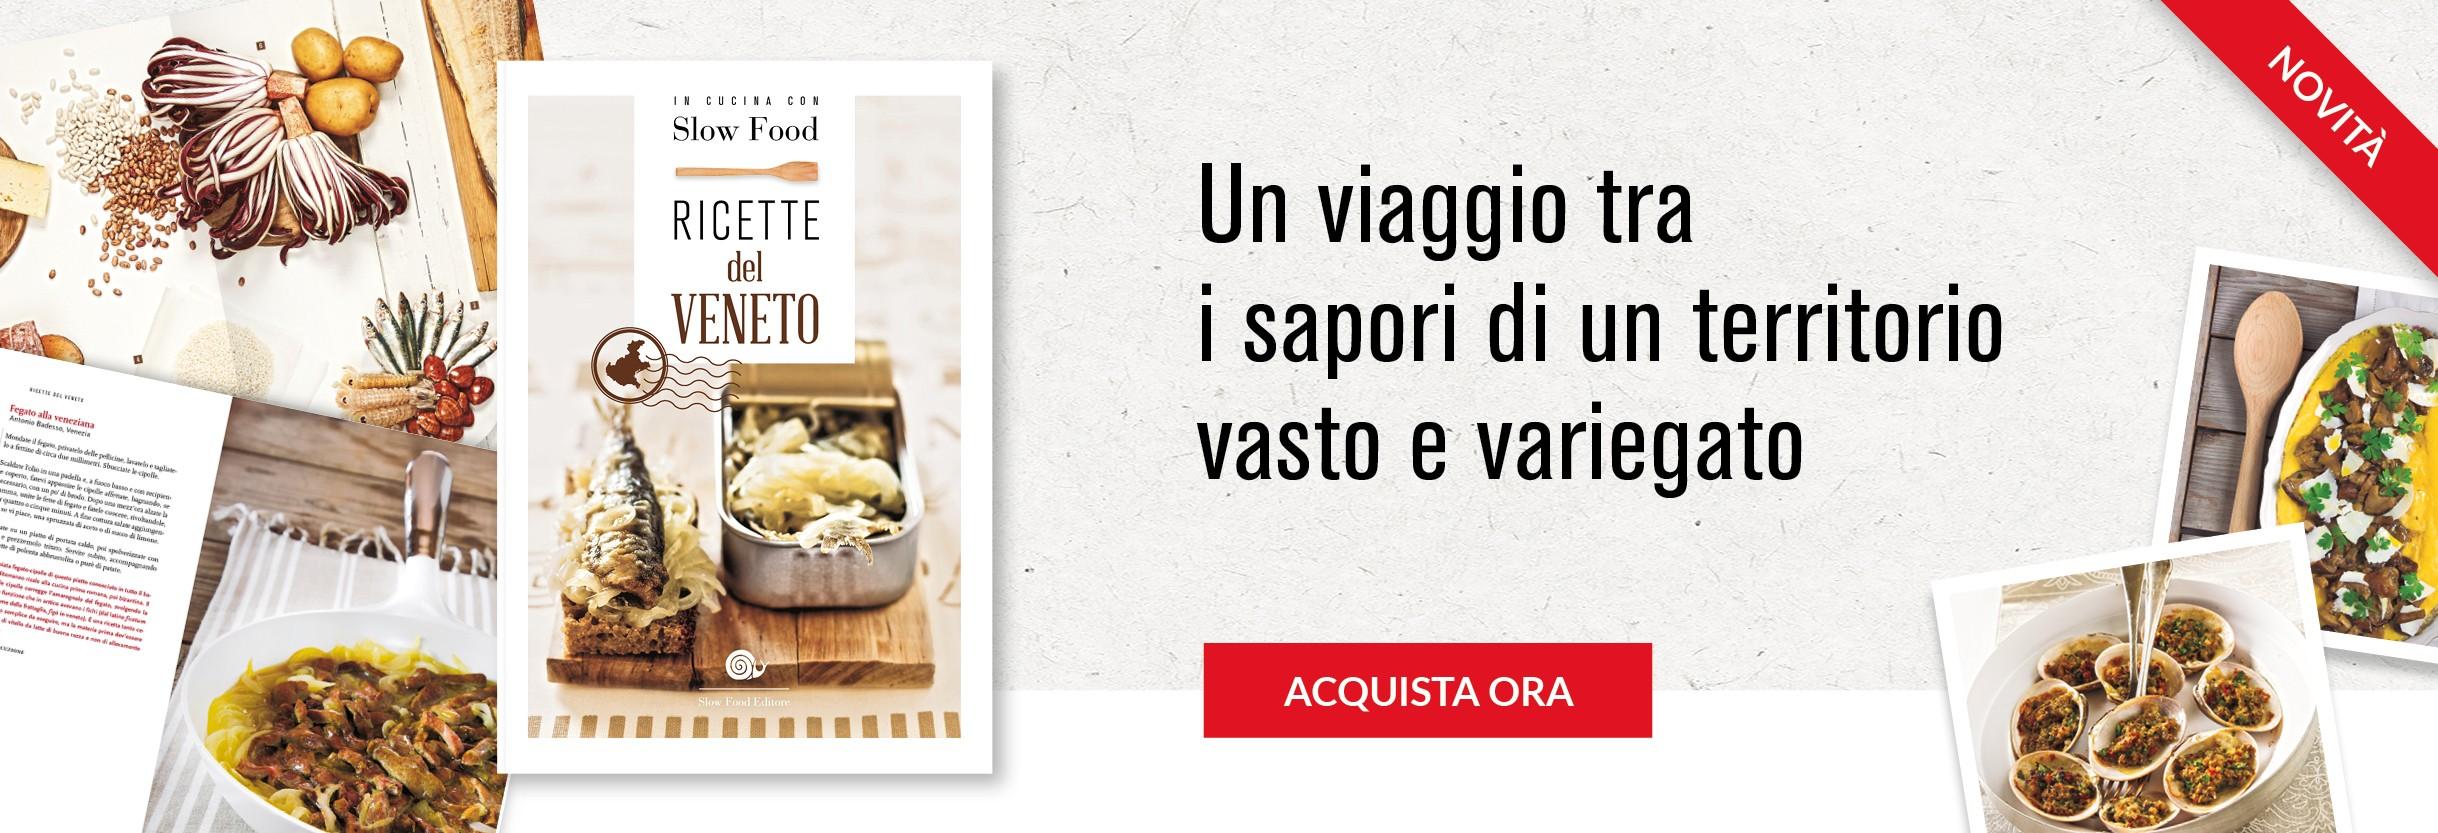 Ricette del Veneto - novità